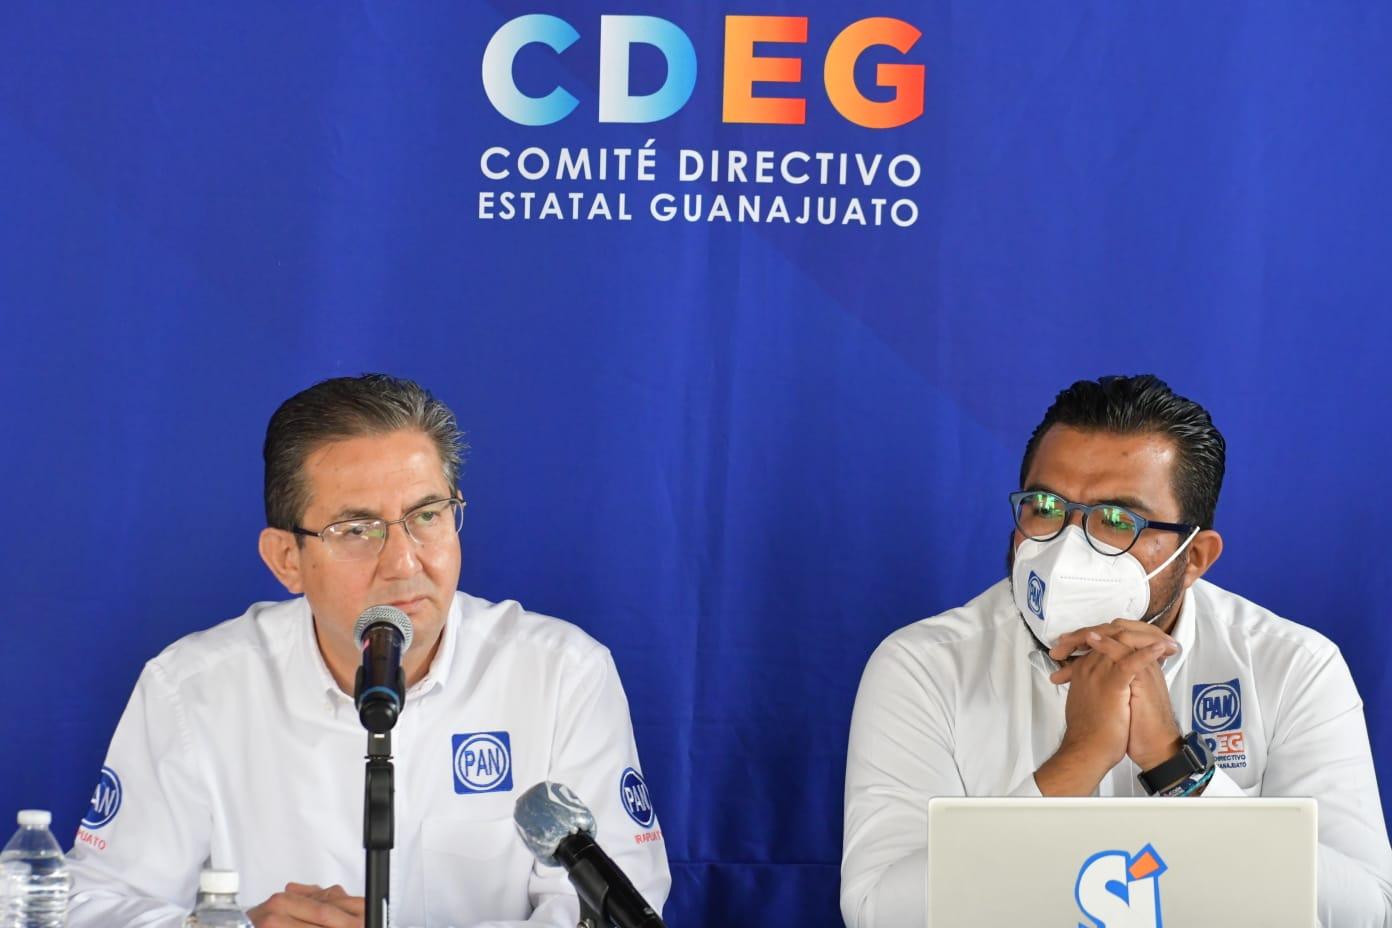 DENUCIA PAN IRAPUATO GUERRA SUCIA EN CAMPAÑAS ELECTORALES 1